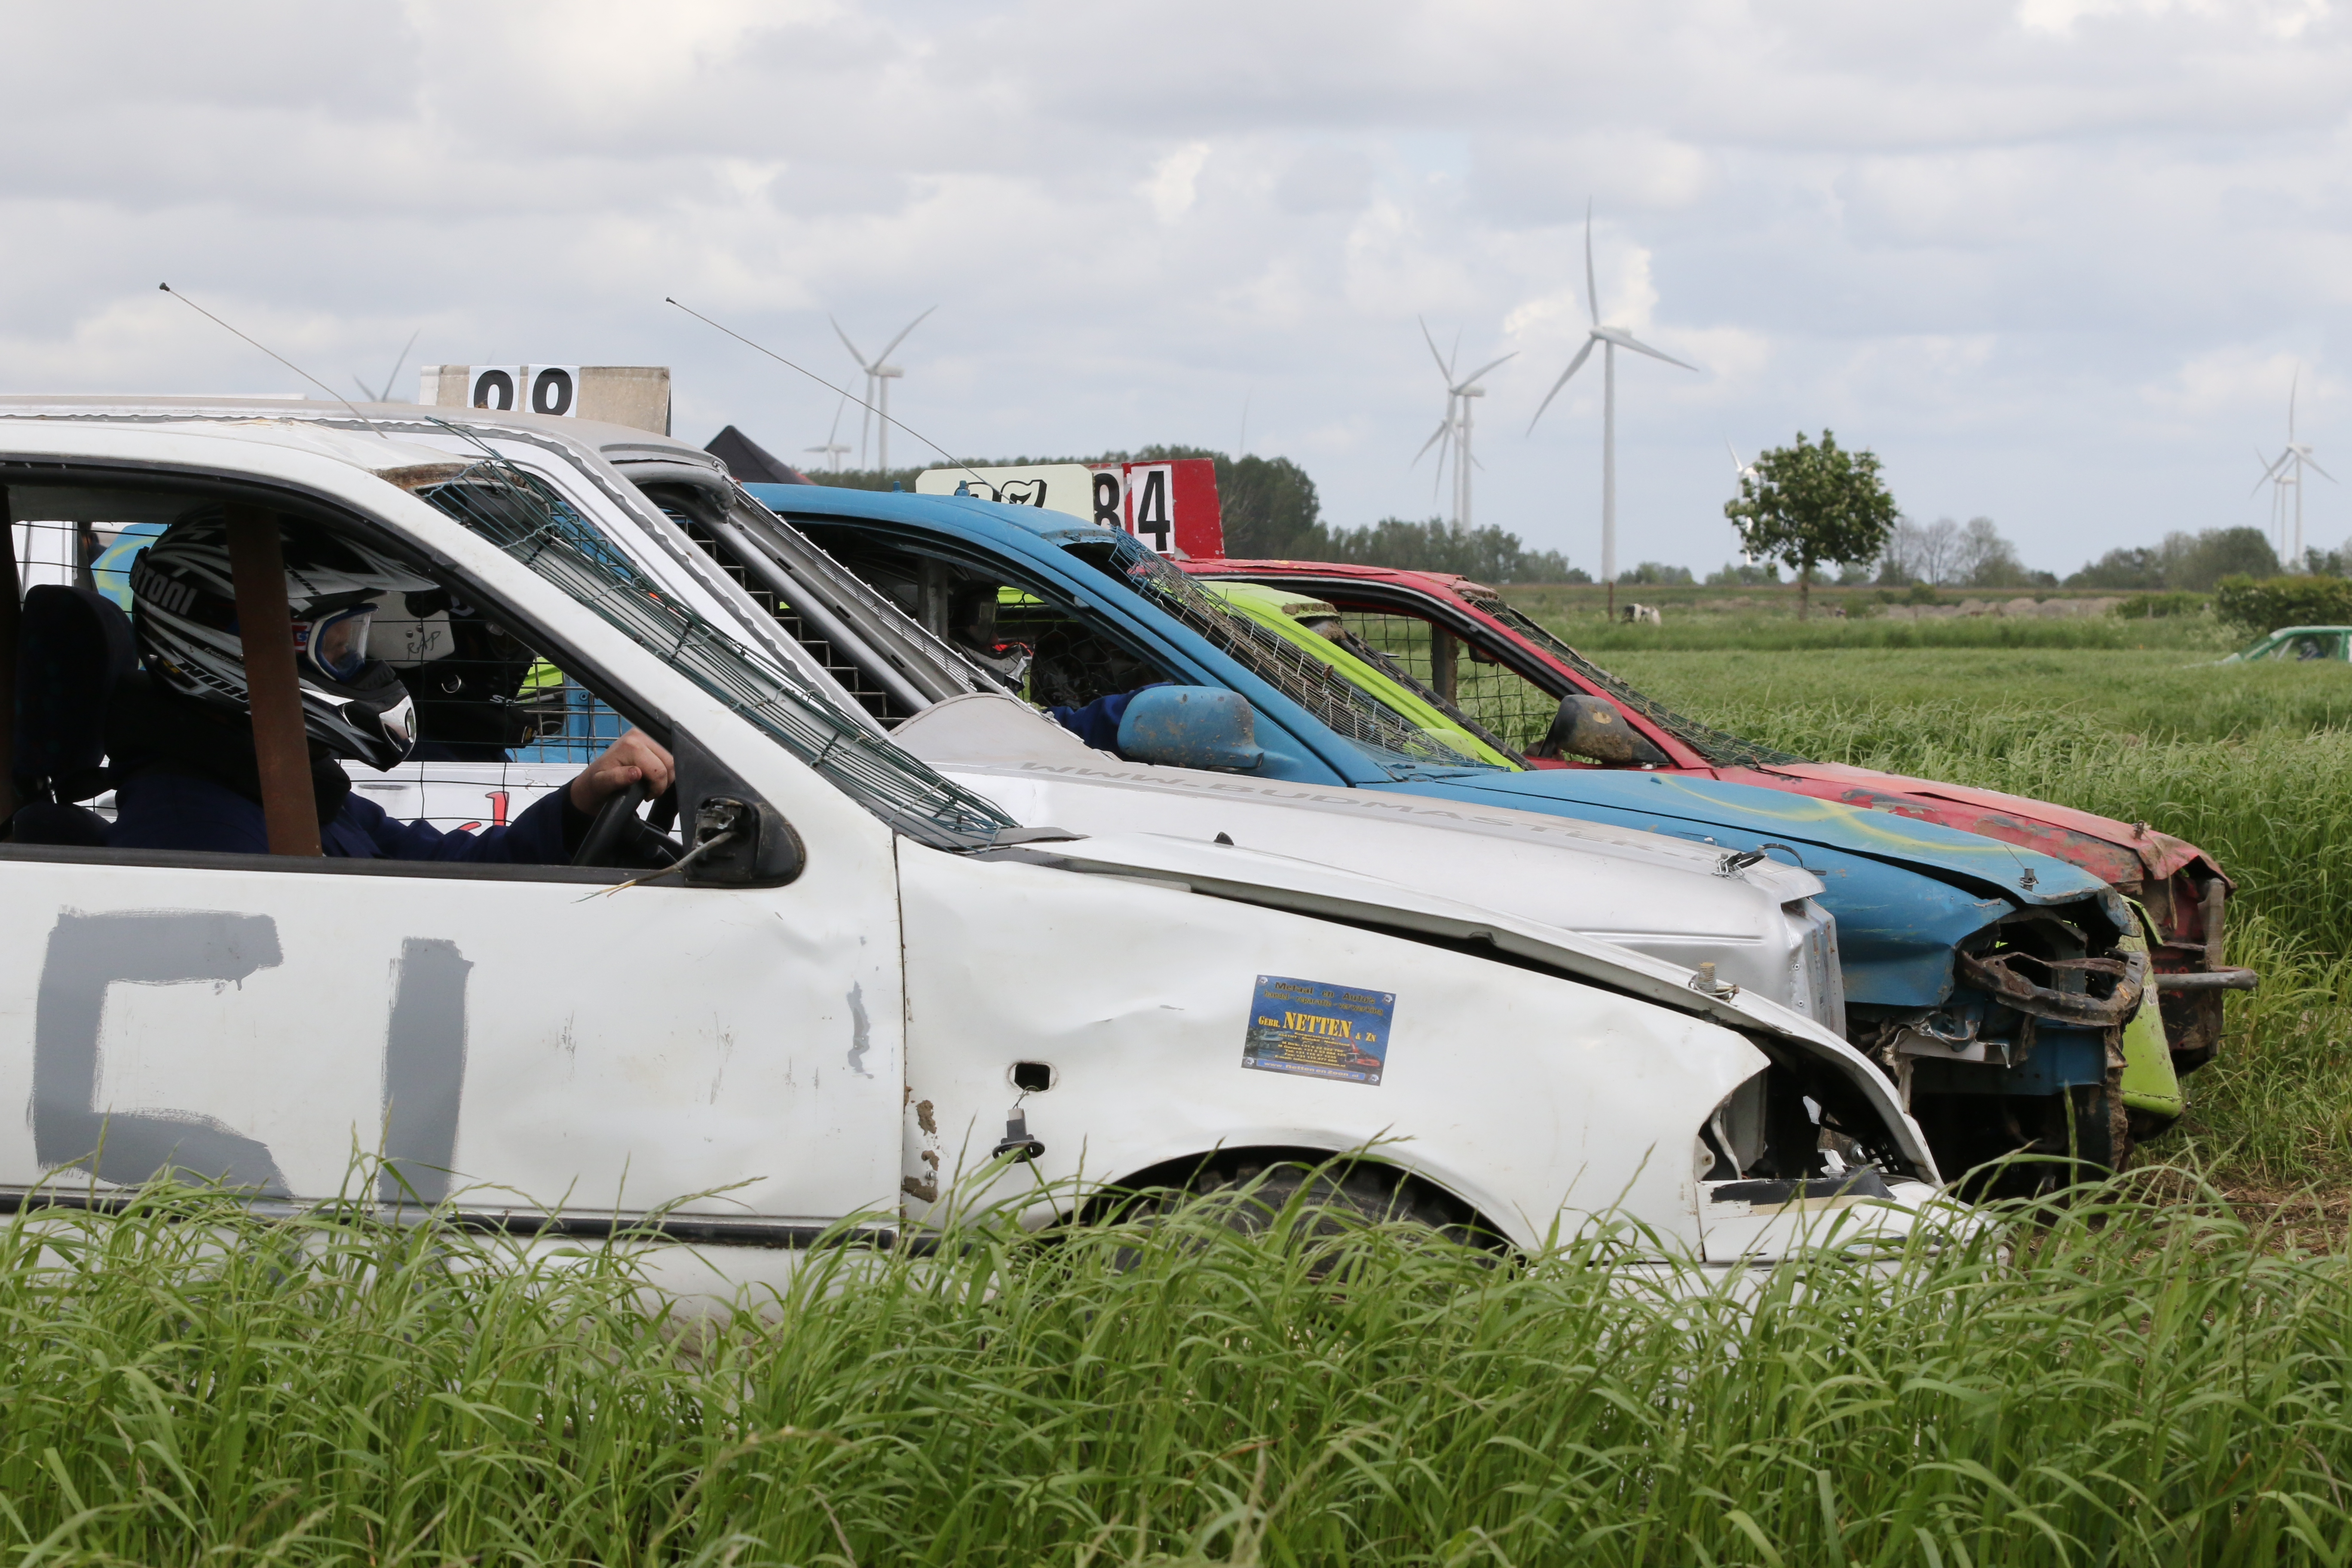 autocross sluiskil 14-5-2016 328